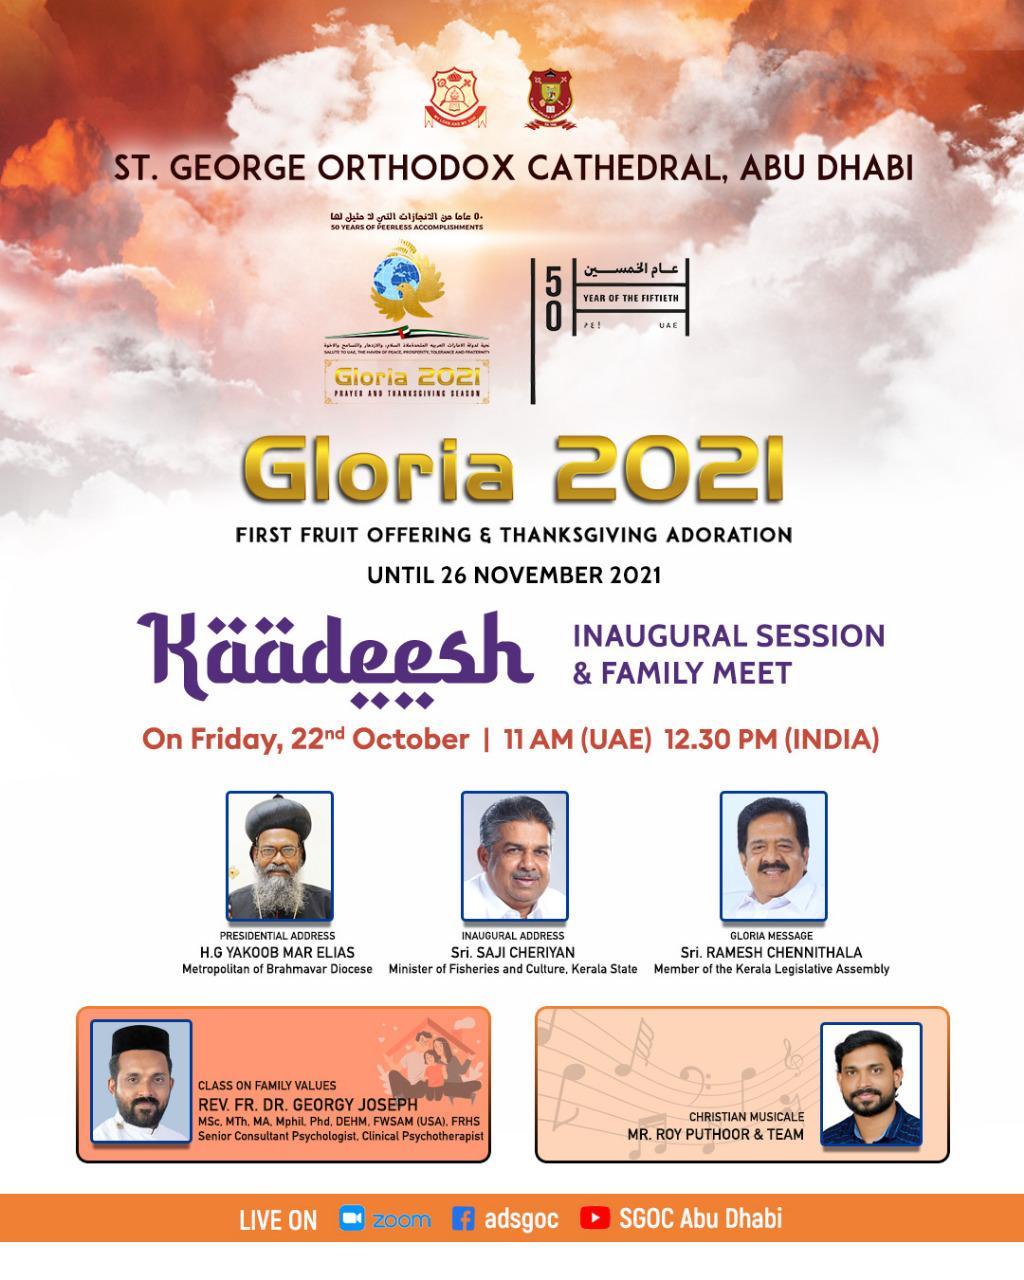 GLORIA-2021 KAADEESH : INAUGURAL SESSION & FAMILY MEET-